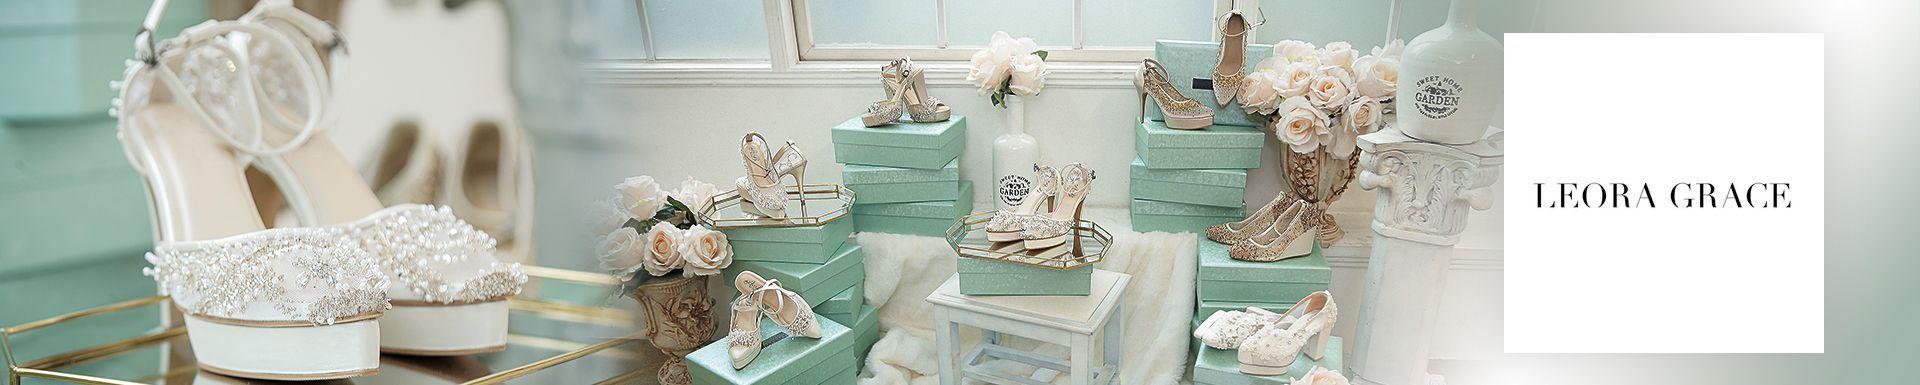 Leora Grace Custom Shoes